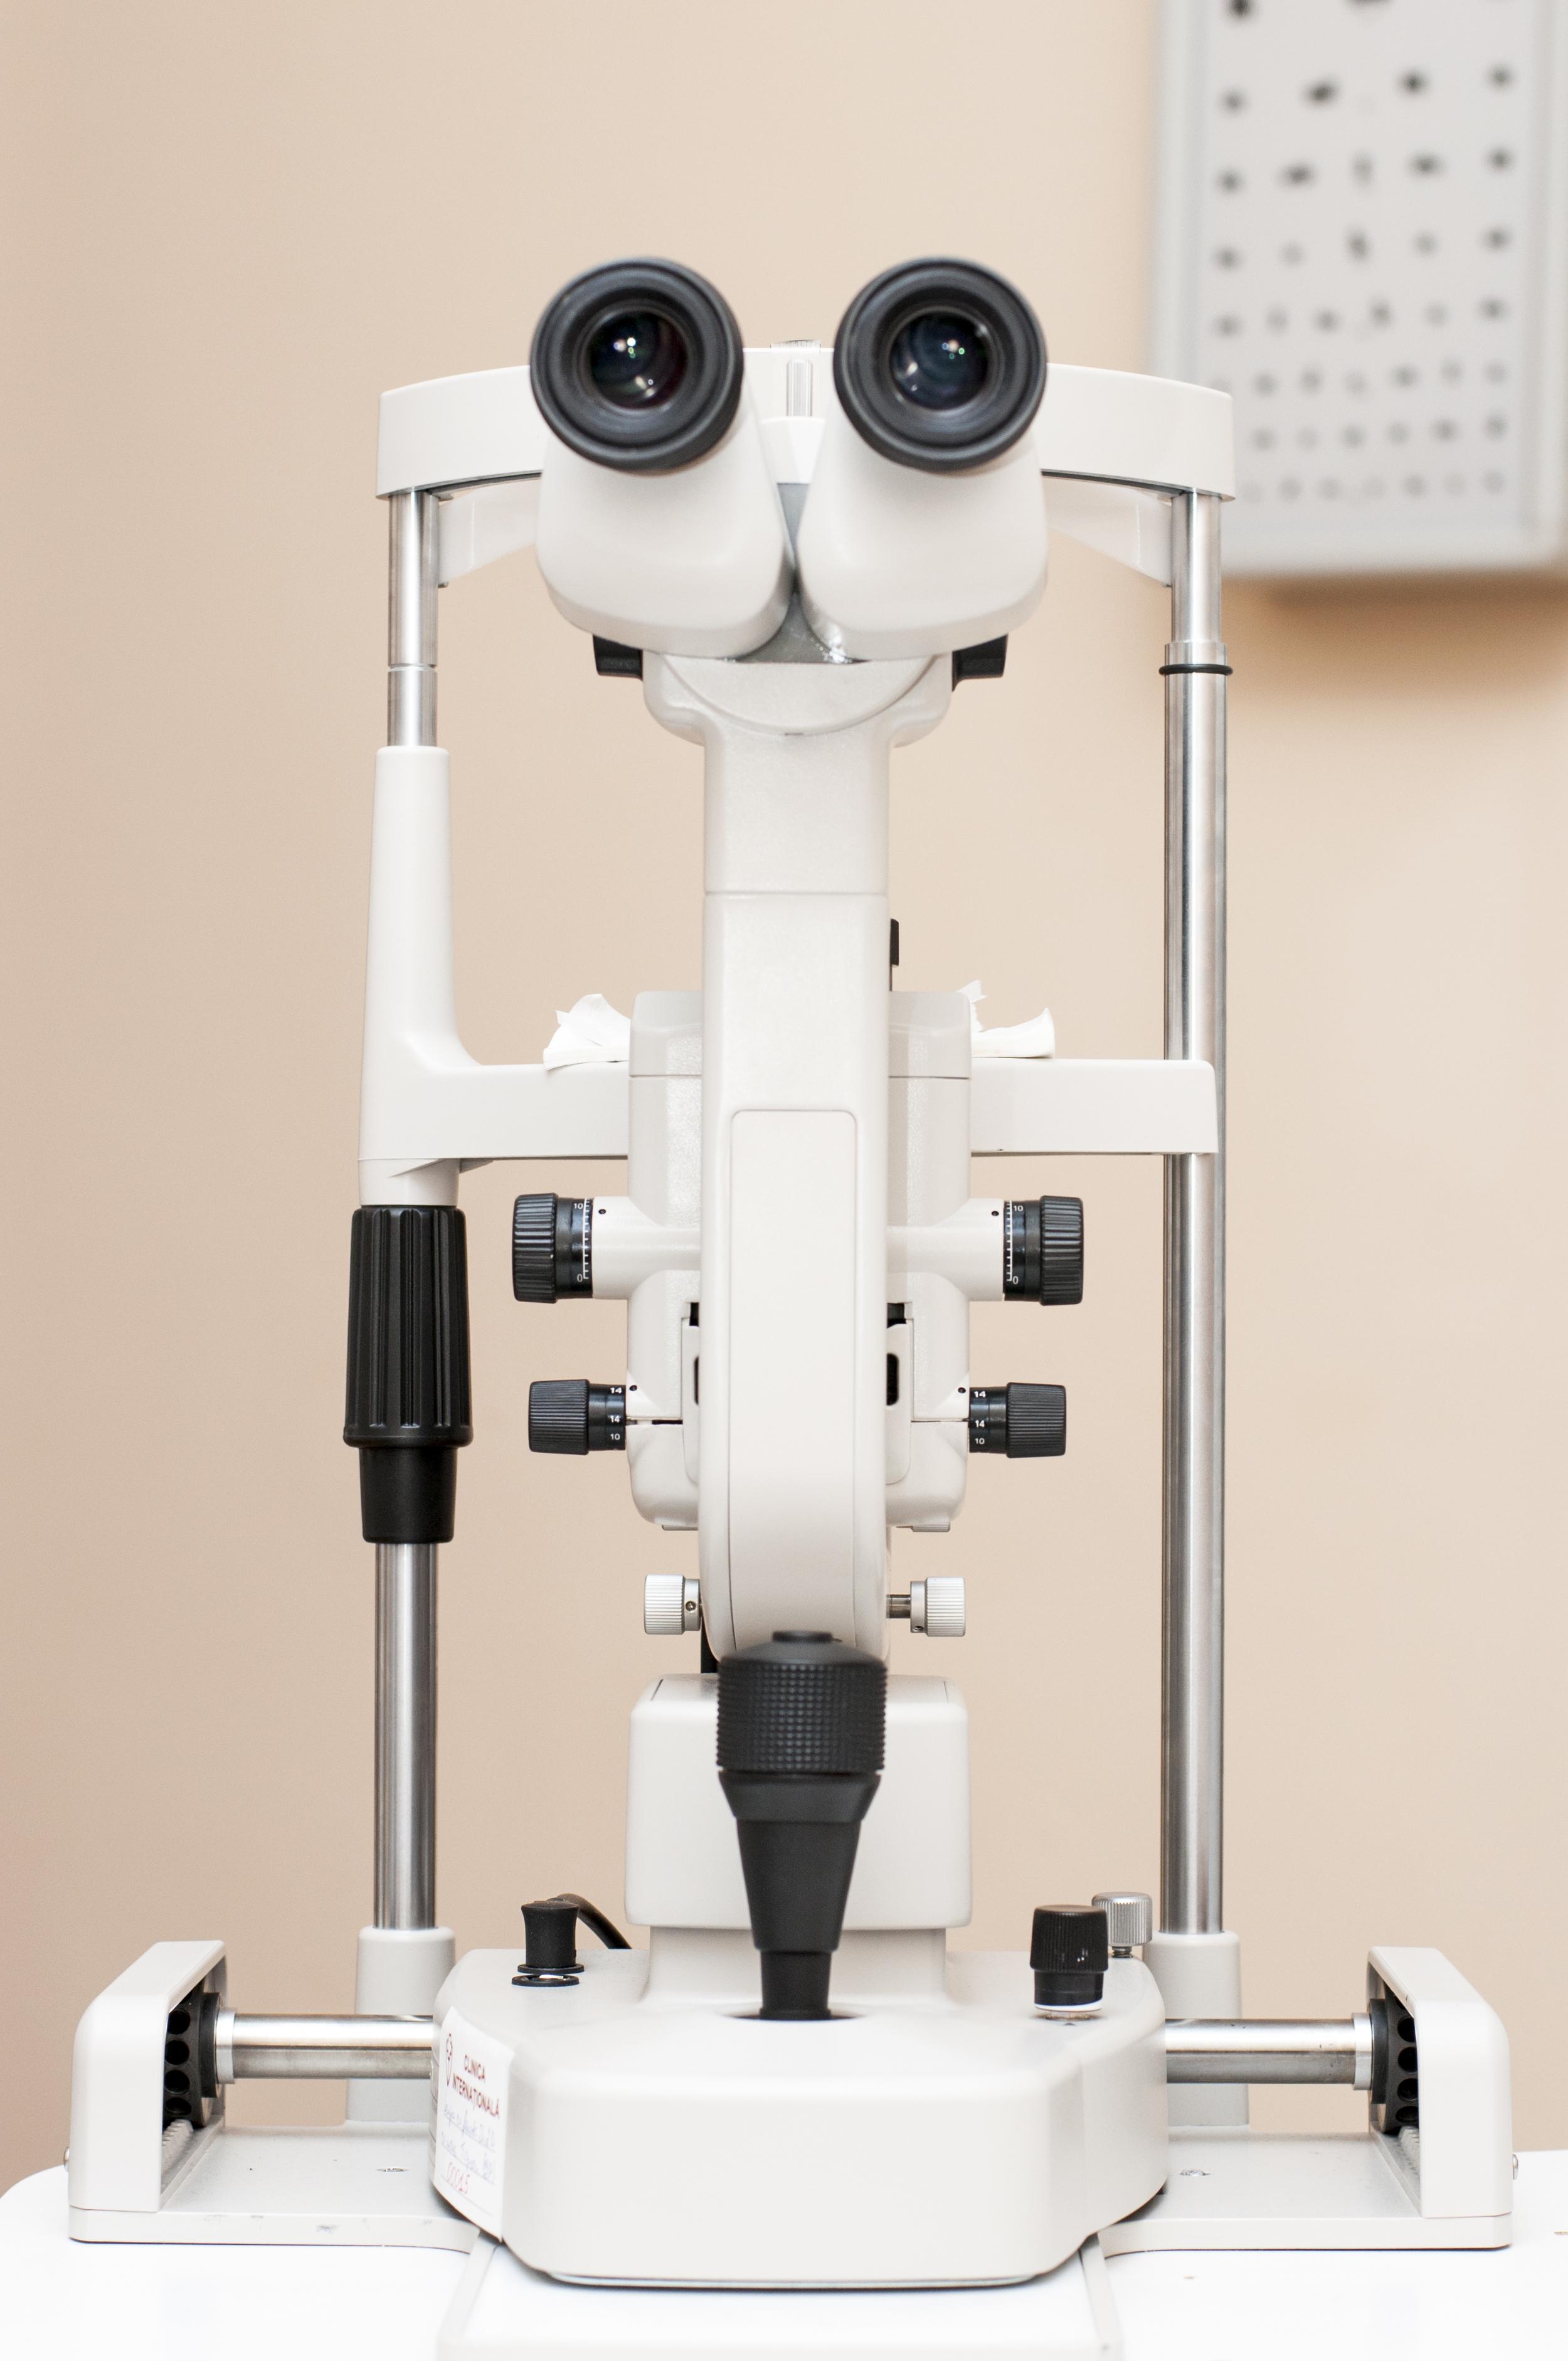 pret echipamente oftalmologie)